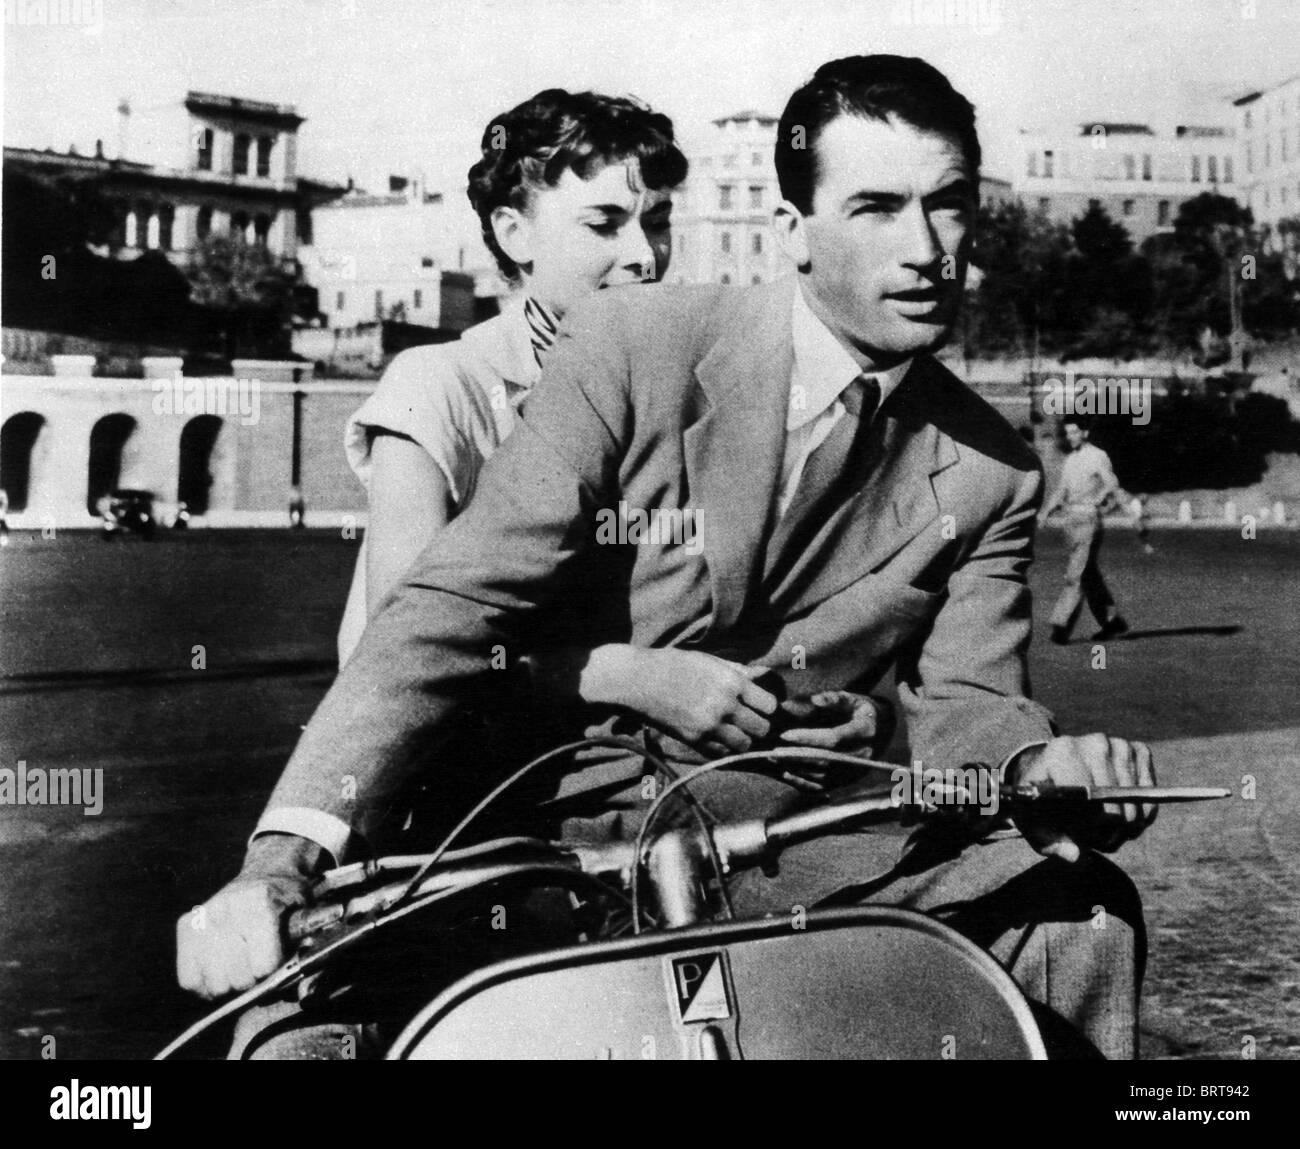 Vacanze Romane 1953 Paramount film con Gregory Peck e Audrey Hepburn Foto  stock - Alamy